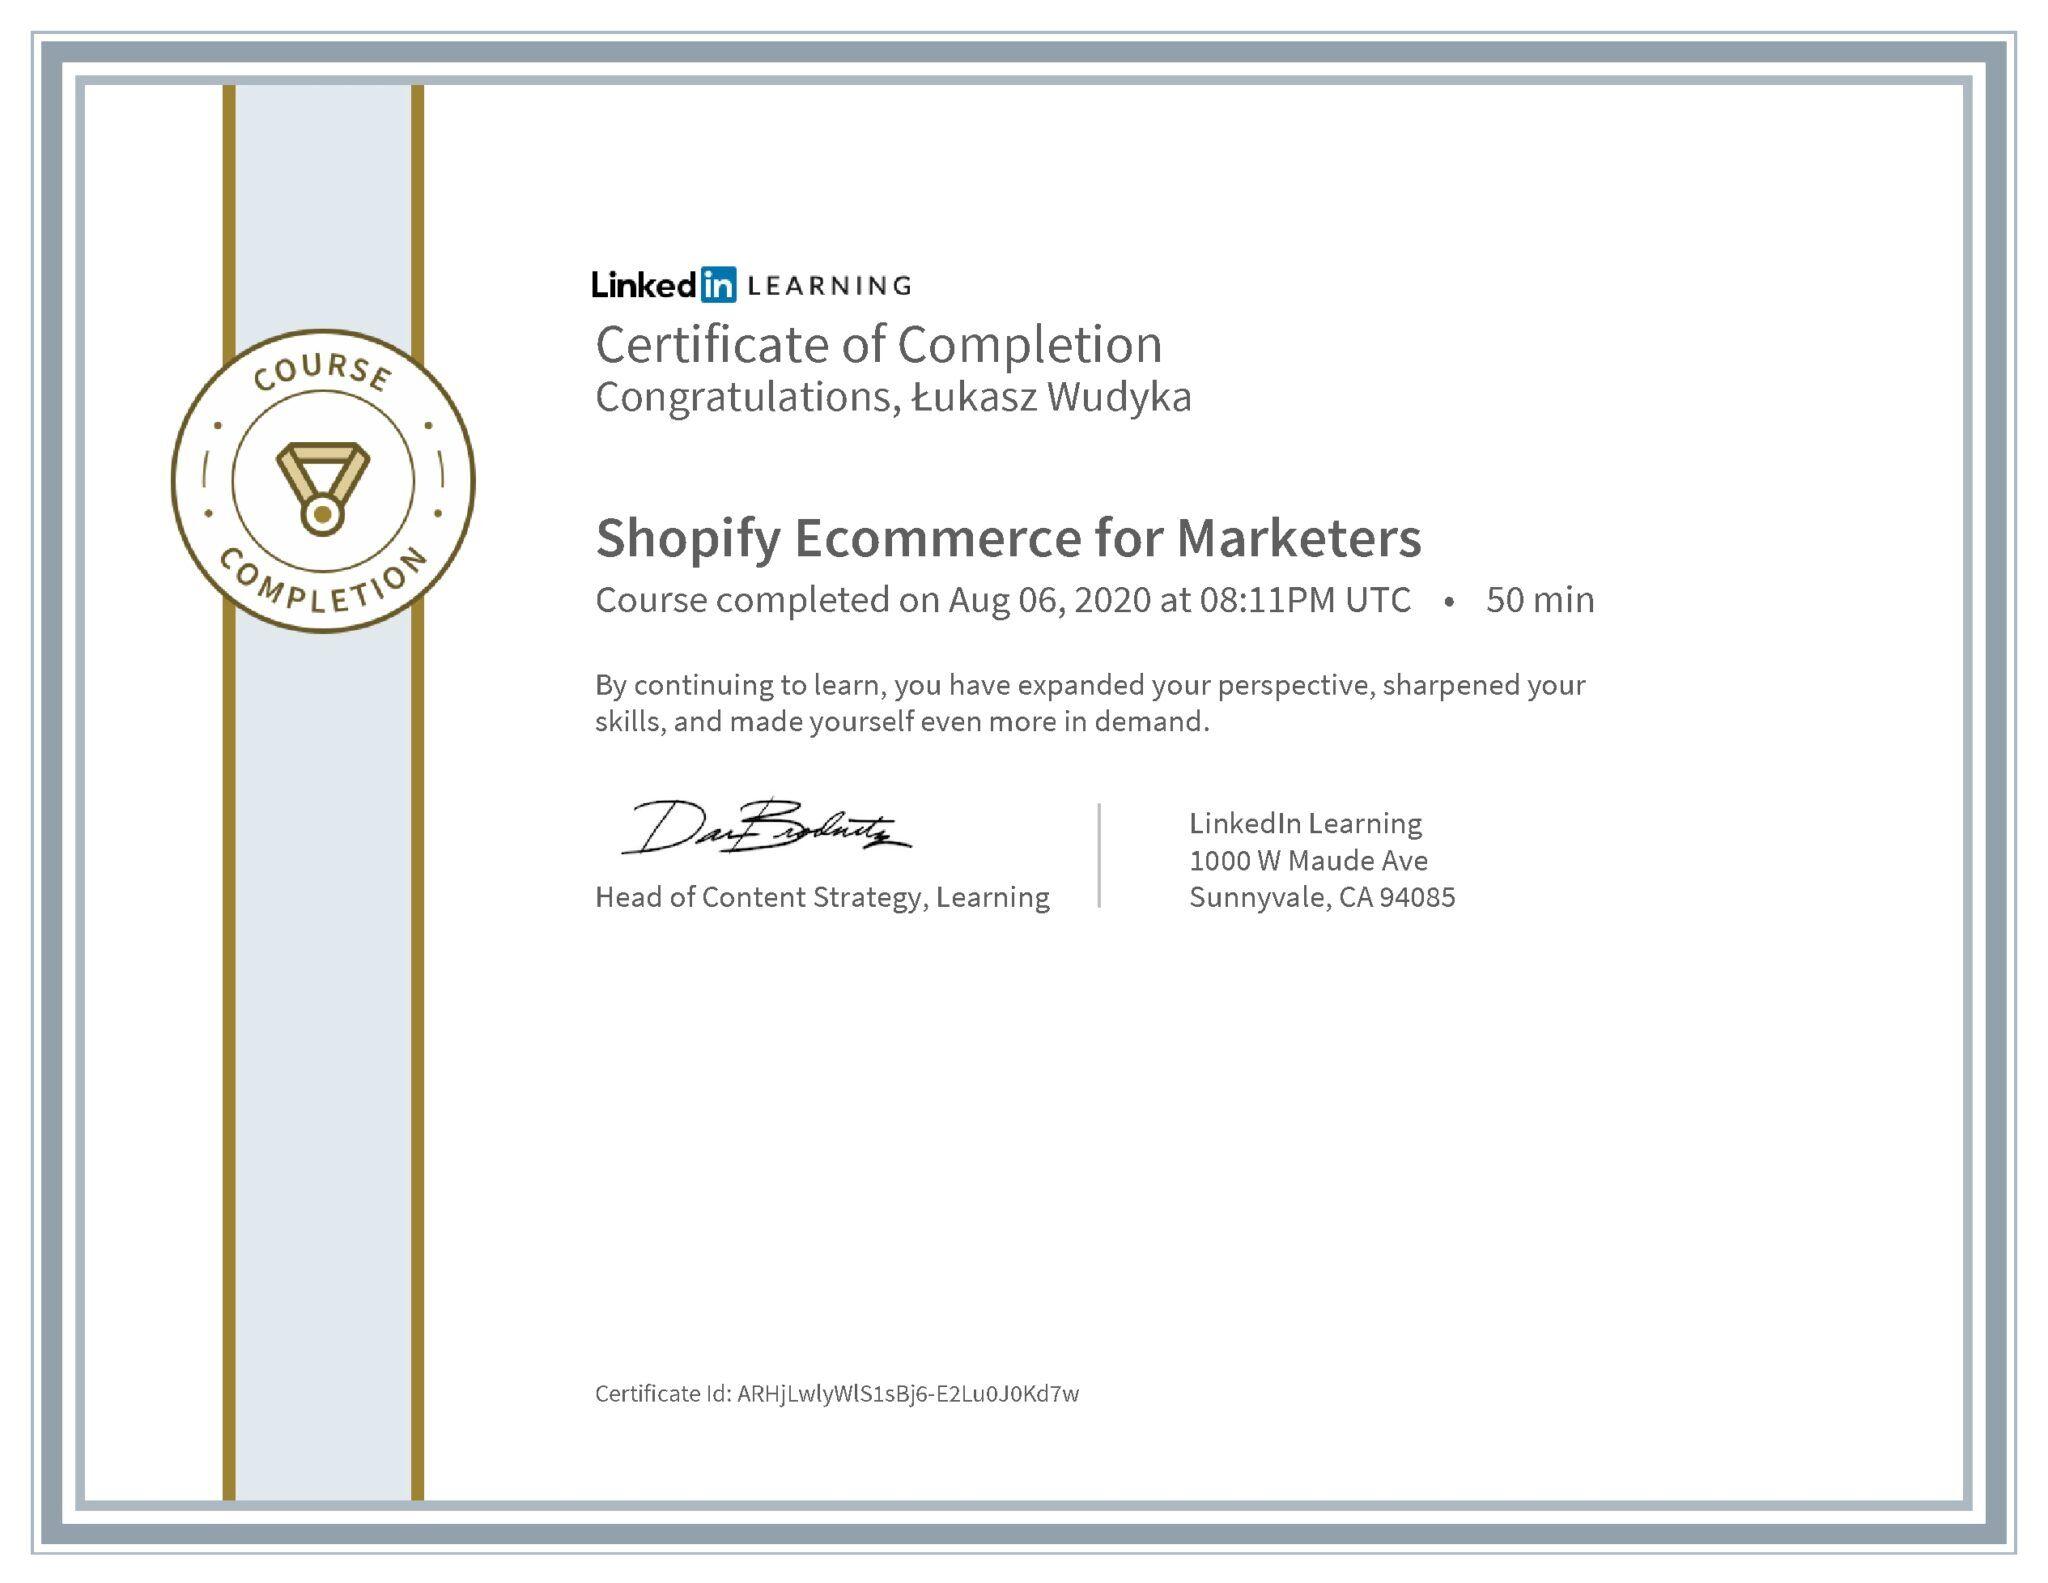 Łukasz Wudyka certyfikat LinkedIn Shopify Ecommerce for Marketers